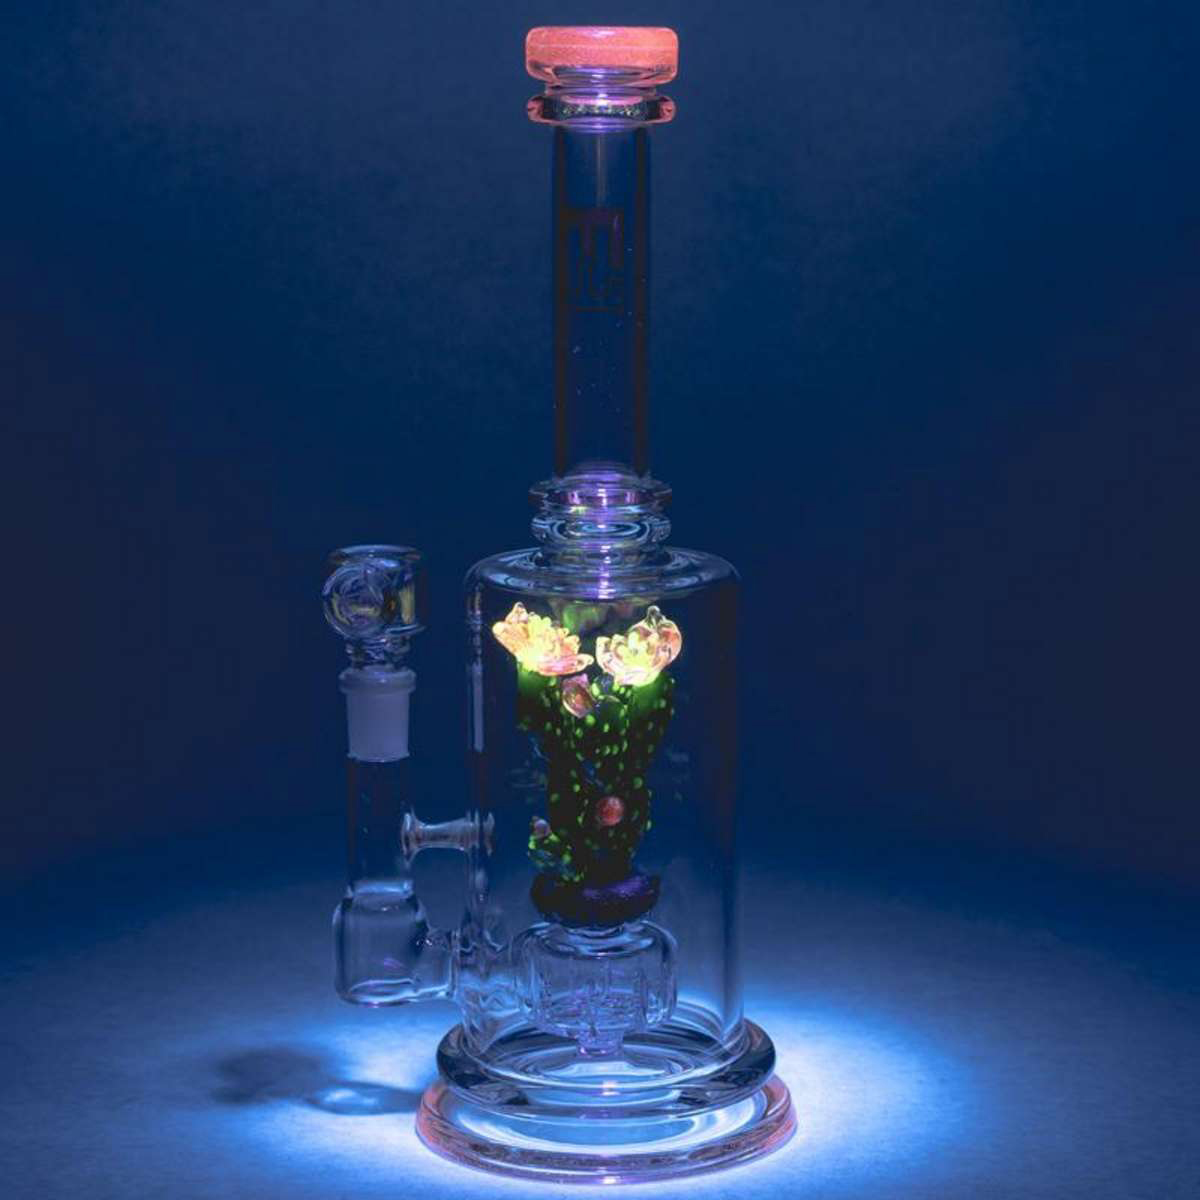 Flagship - Bioluminescent Cactus - UV Reactive